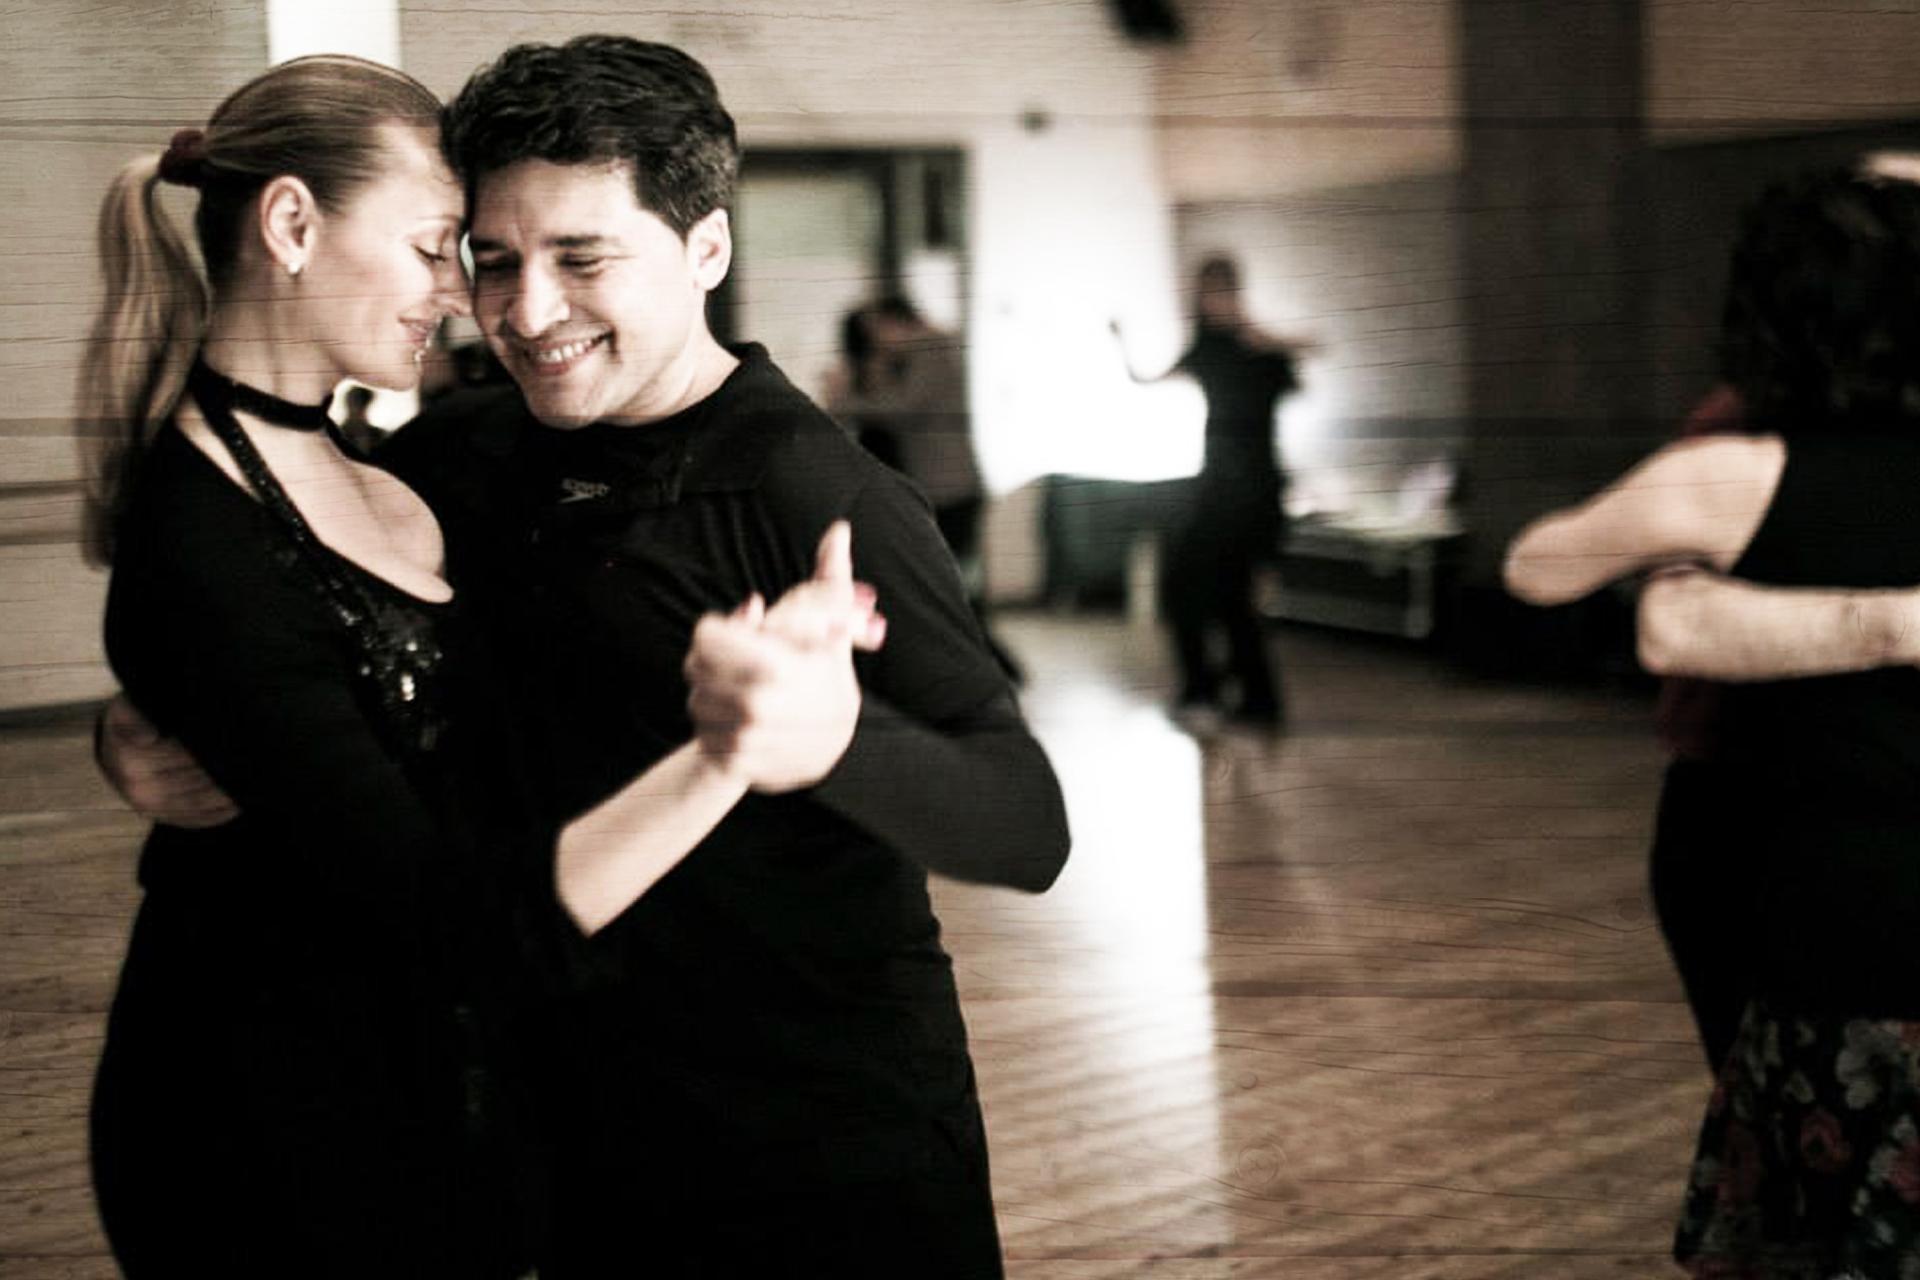 Tango vuoi provare?